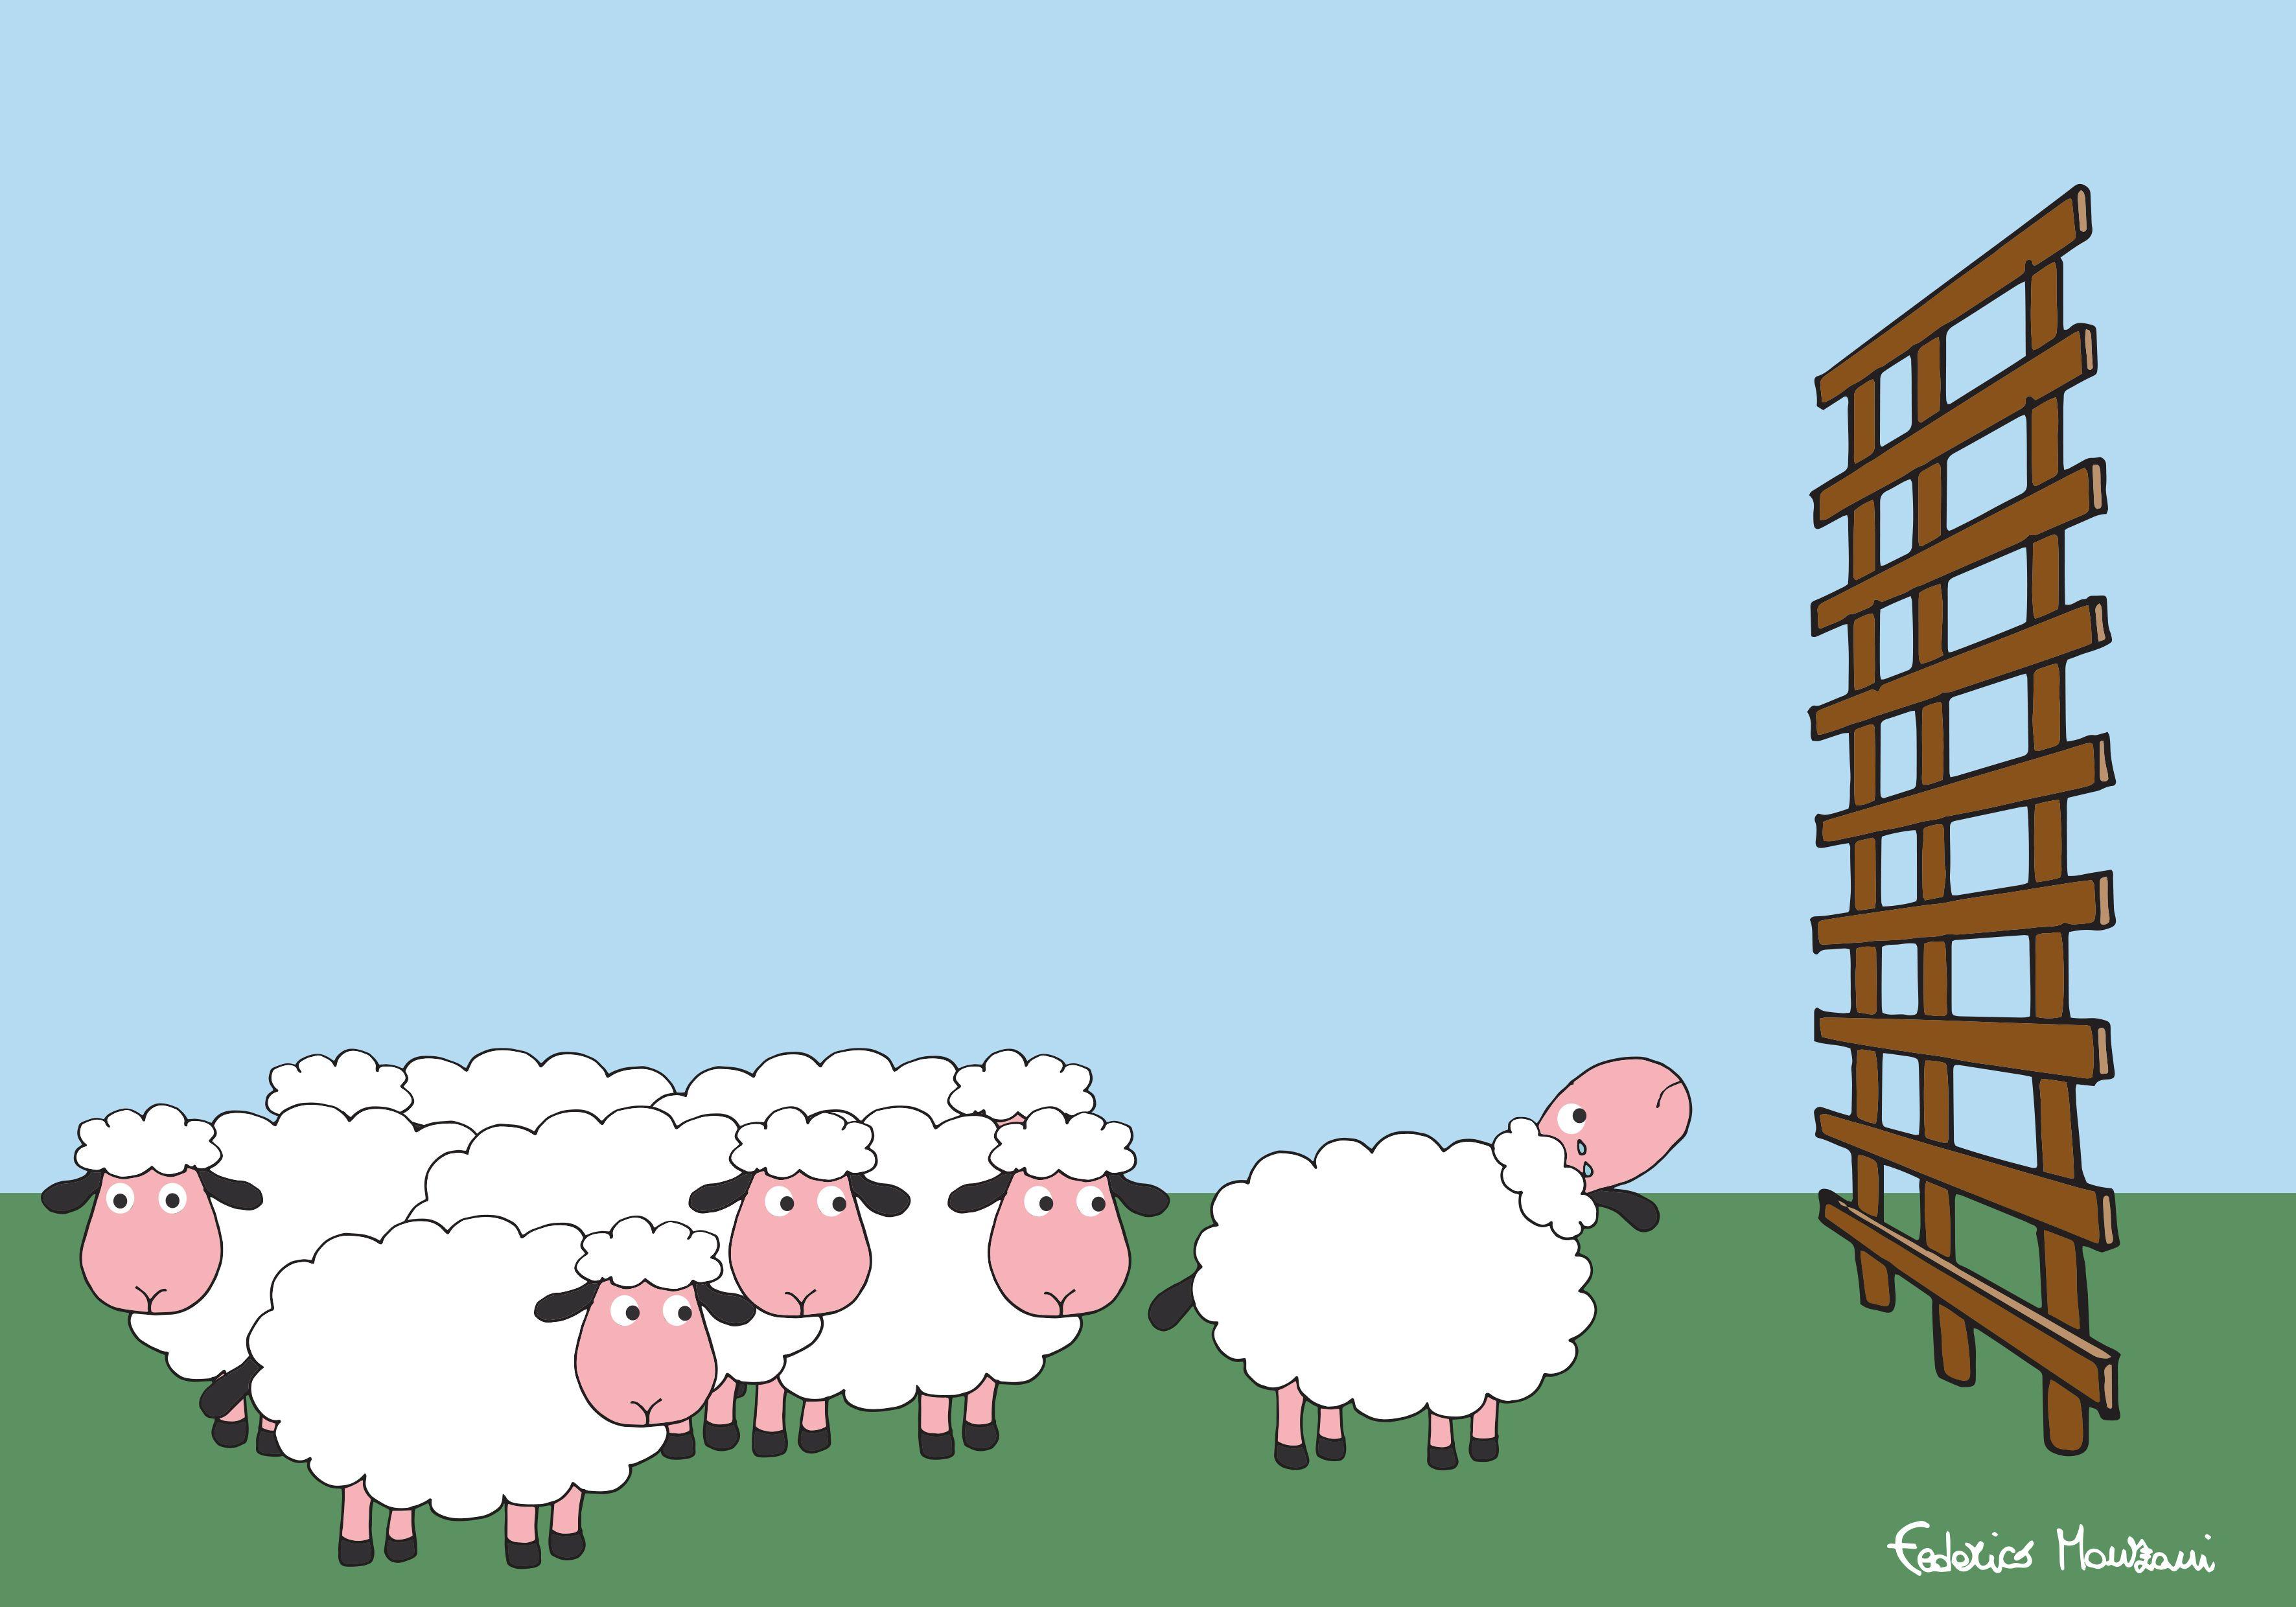 Sheep by Federico Monzani